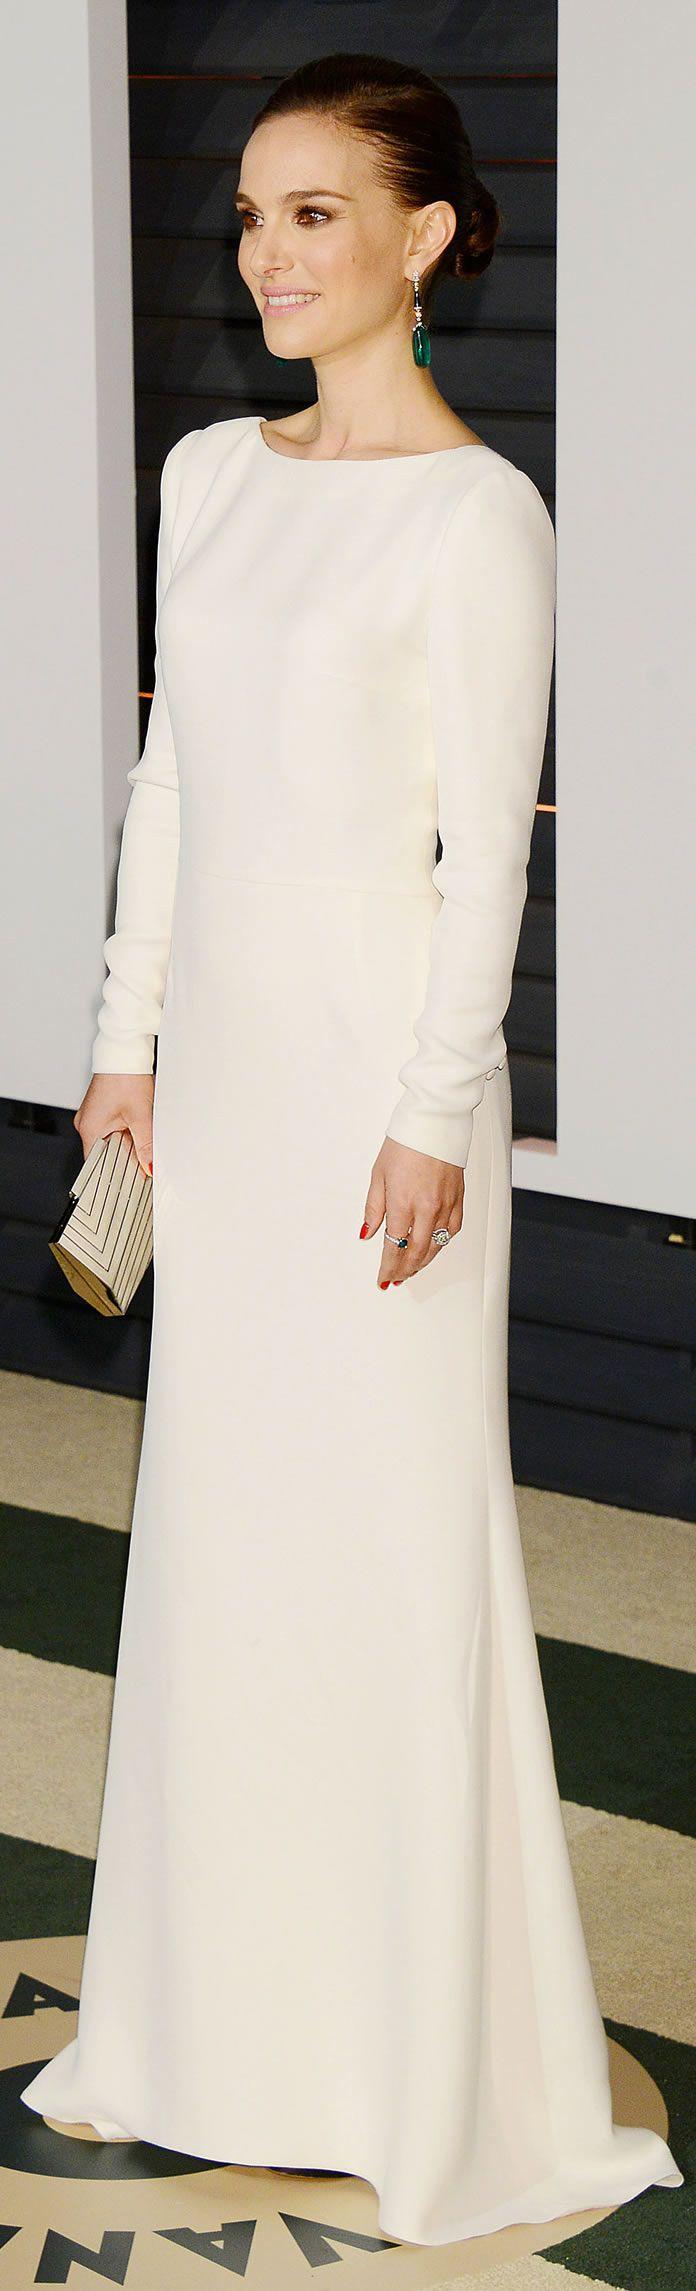 Natalie Portman In Dior | cynthia reccord